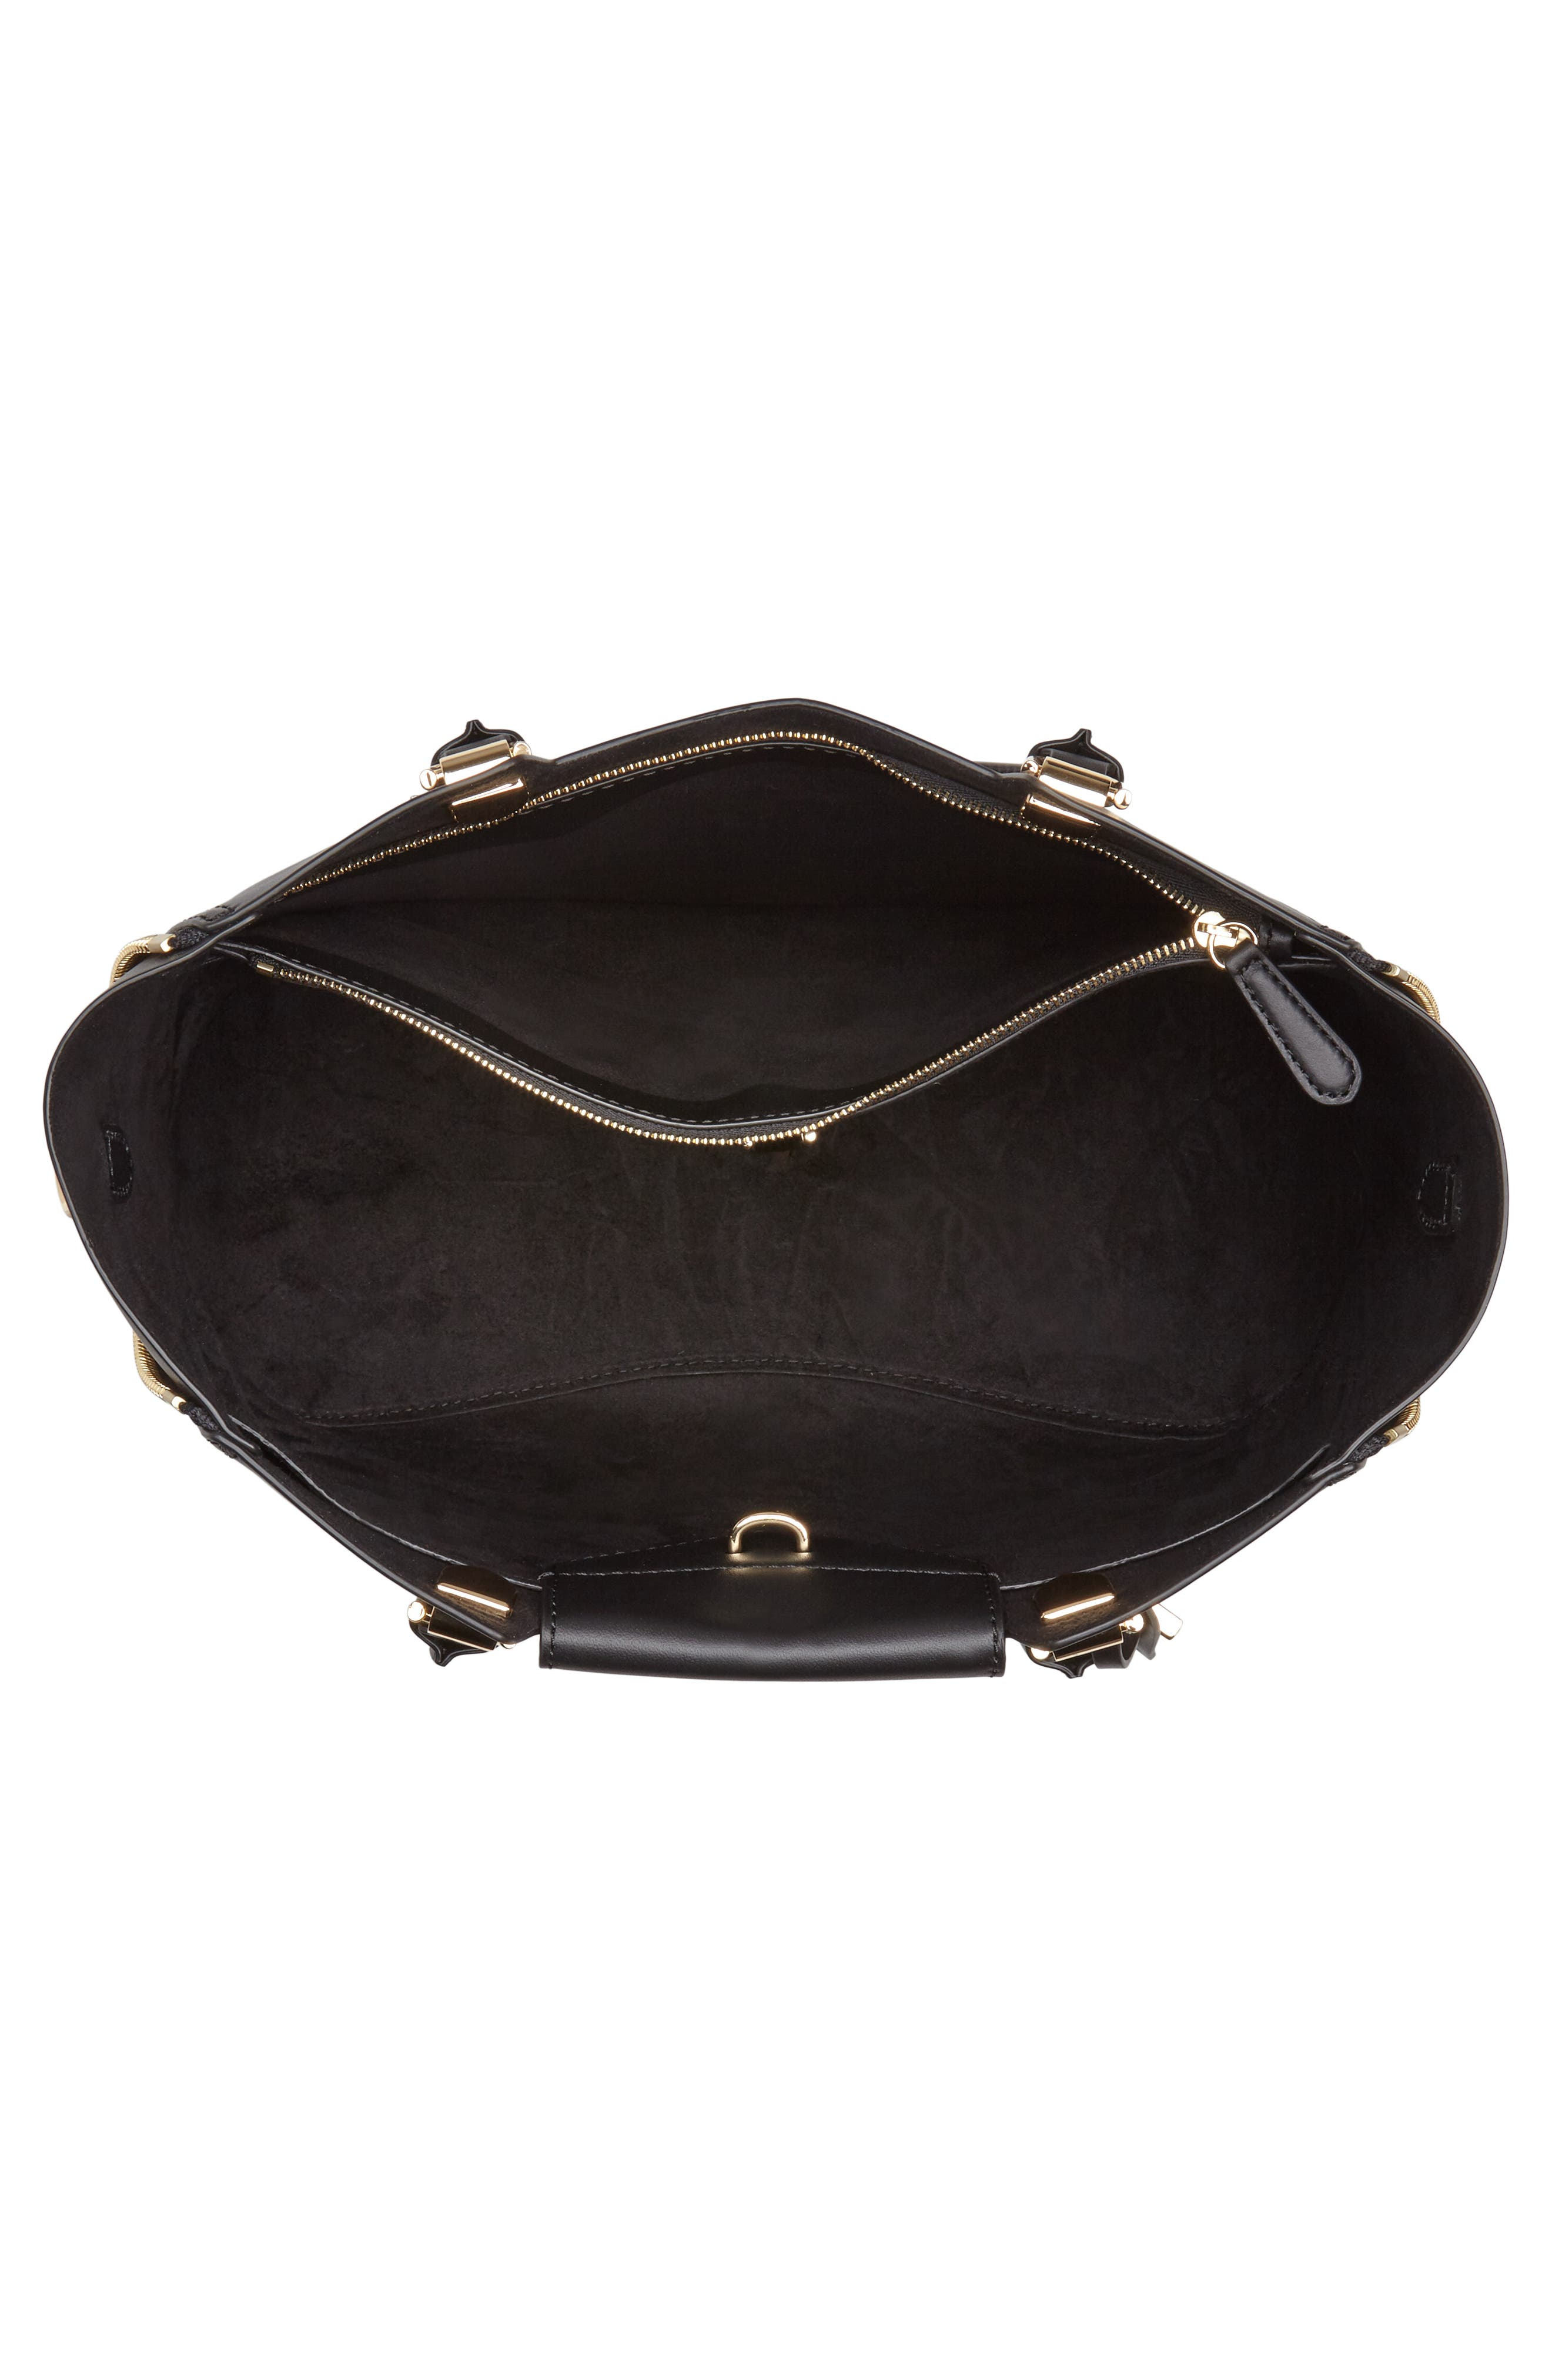 MICHAEL Michael Kors Blakely Leather Satchel,                             Alternate thumbnail 4, color,                             Black